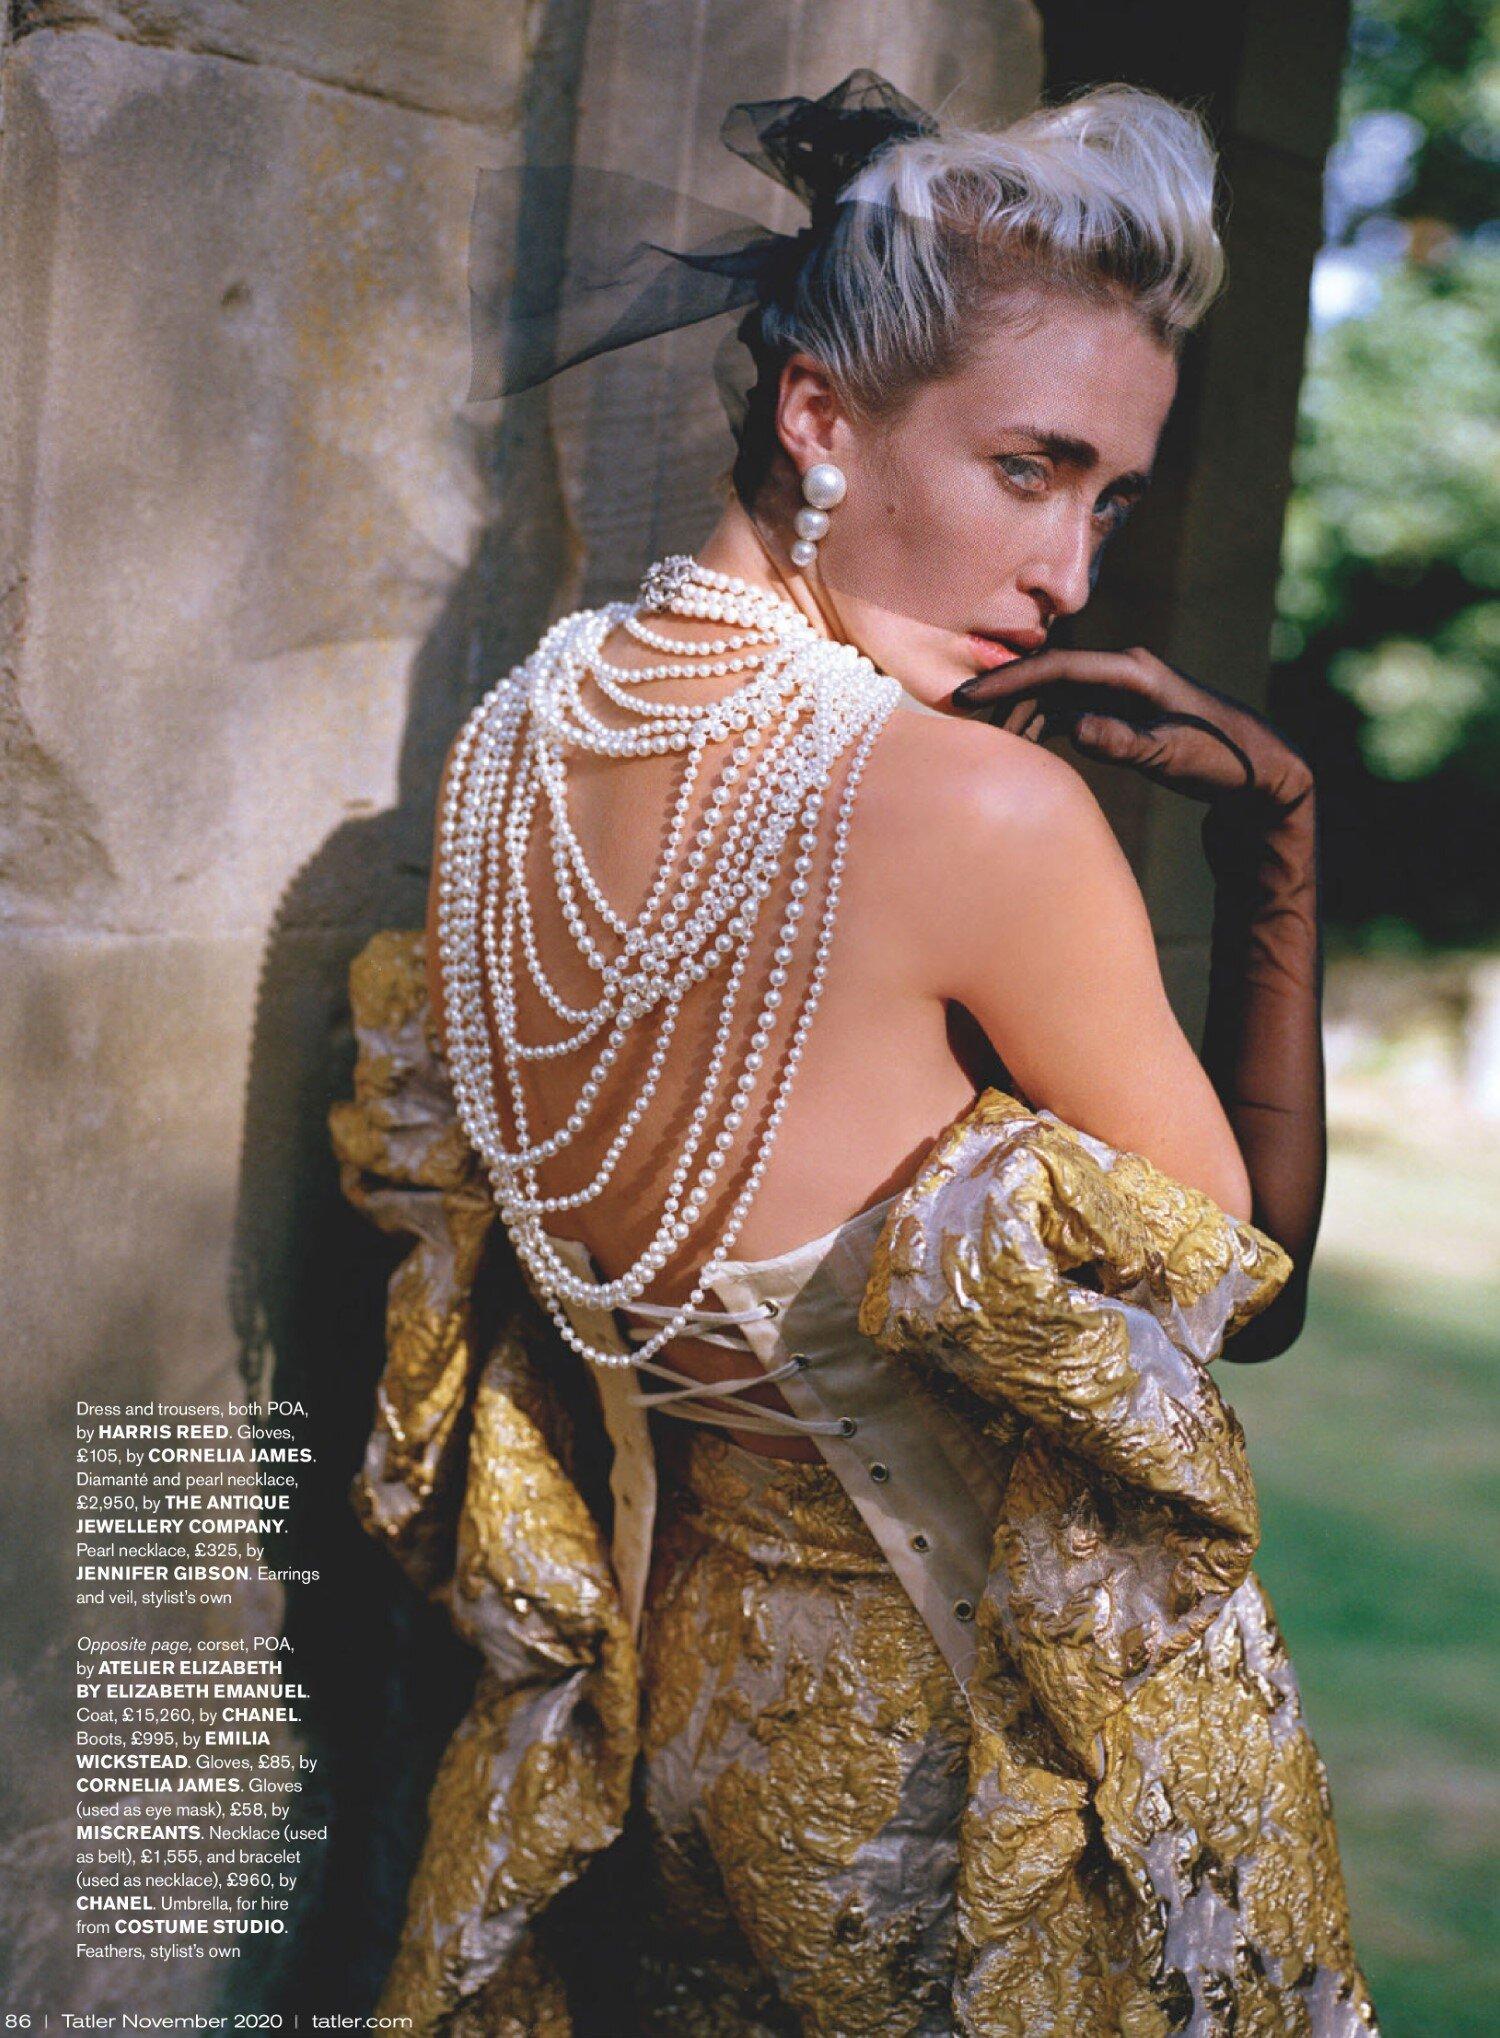 Jennifer Gibson Jewellery Pearl Necklace Georgia Howorth Oli Kearon Tatler Nov 2020 (2)